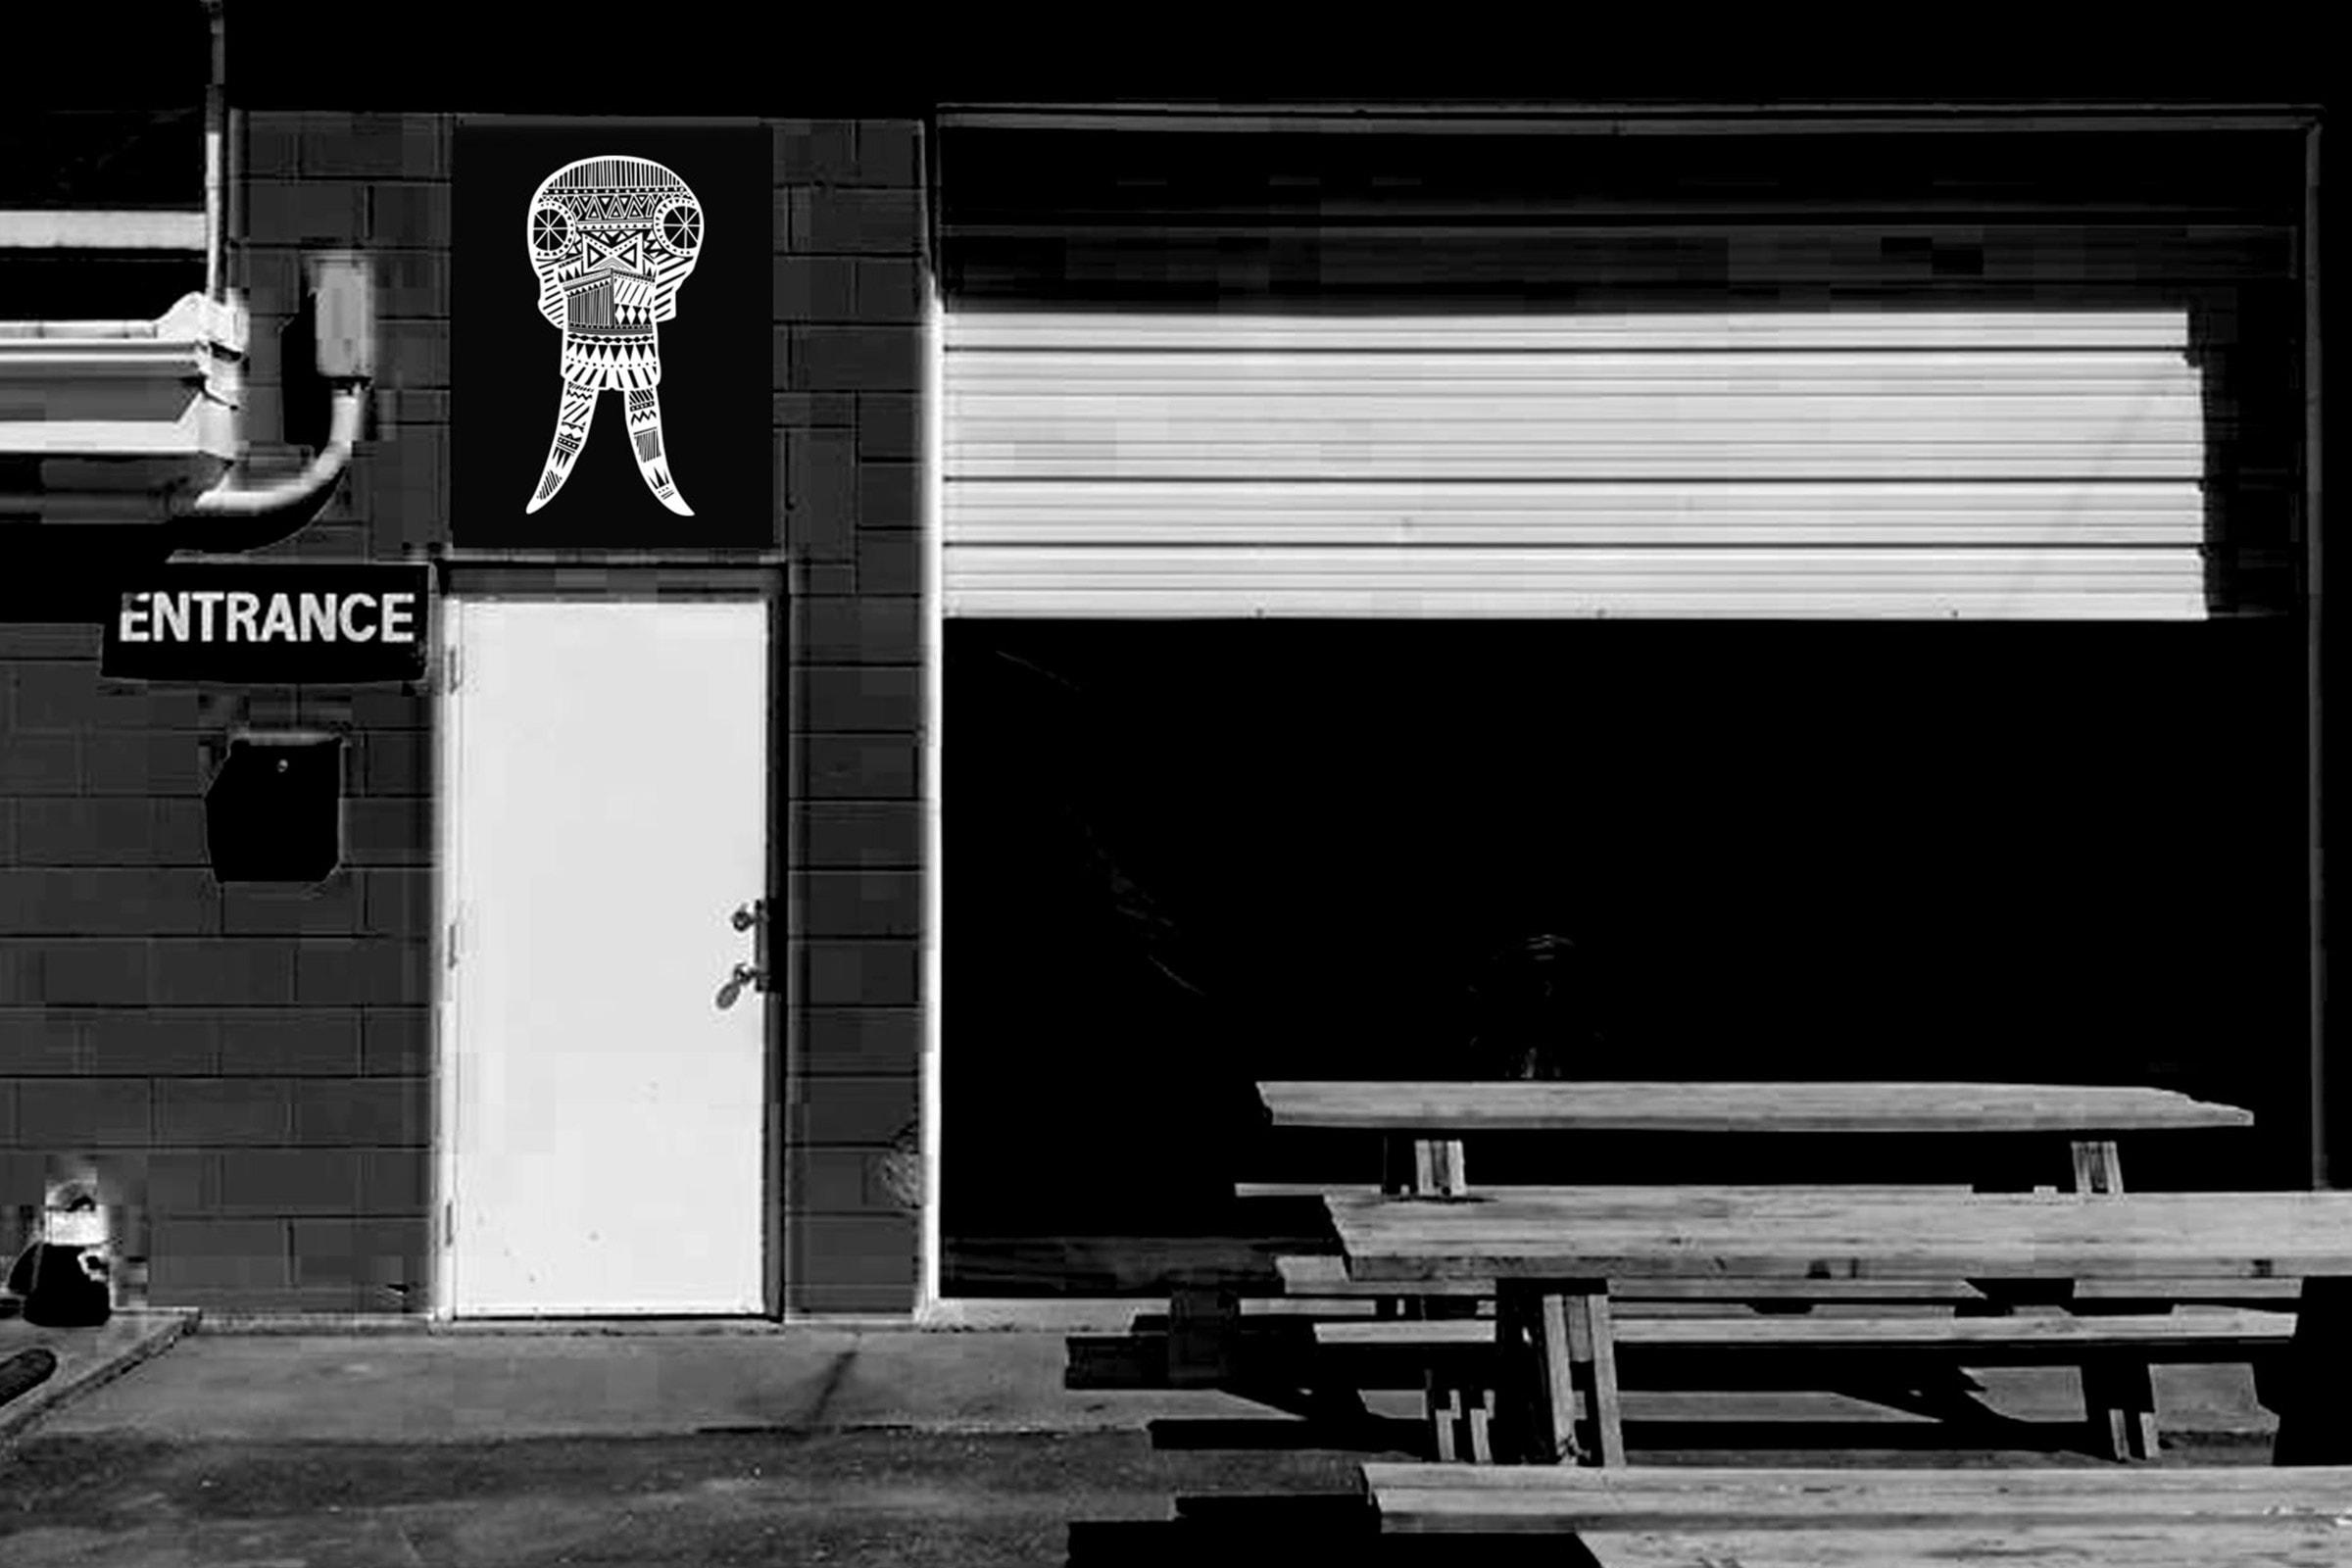 Gebäude Branding, Start Up, Artisanal Brewery, Craft Beer, New York Bier